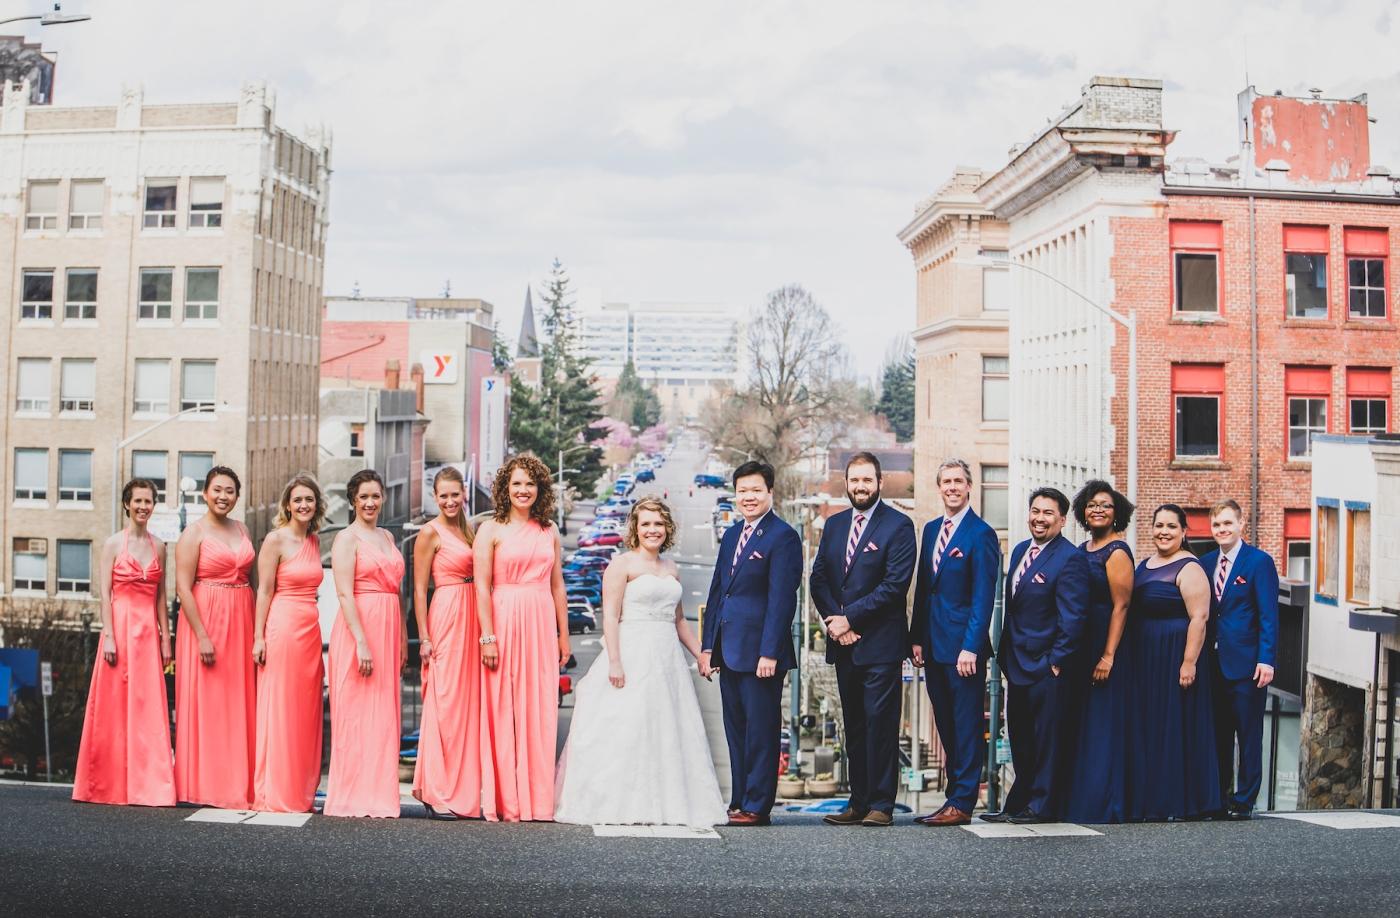 DSC_2245Everett_Wedding_Ballroom_Jane_Speleers_photography_Rachel_and_Edmund_Bridesmaids_peach_dresses_groomsmen_2017